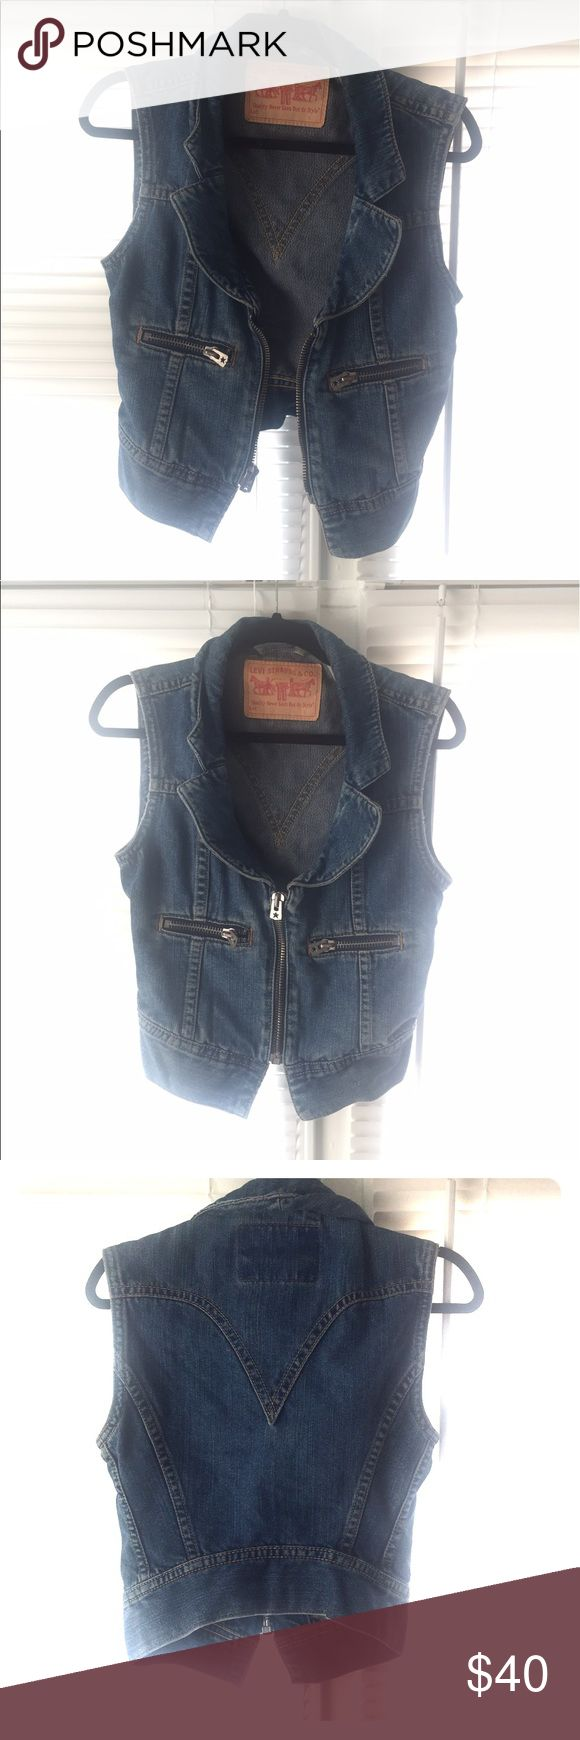 Vintage Levi's vest Denim Jacket Vintage Levi's Sleeveless Denim Jacket Levi's Jackets & Coats Vests